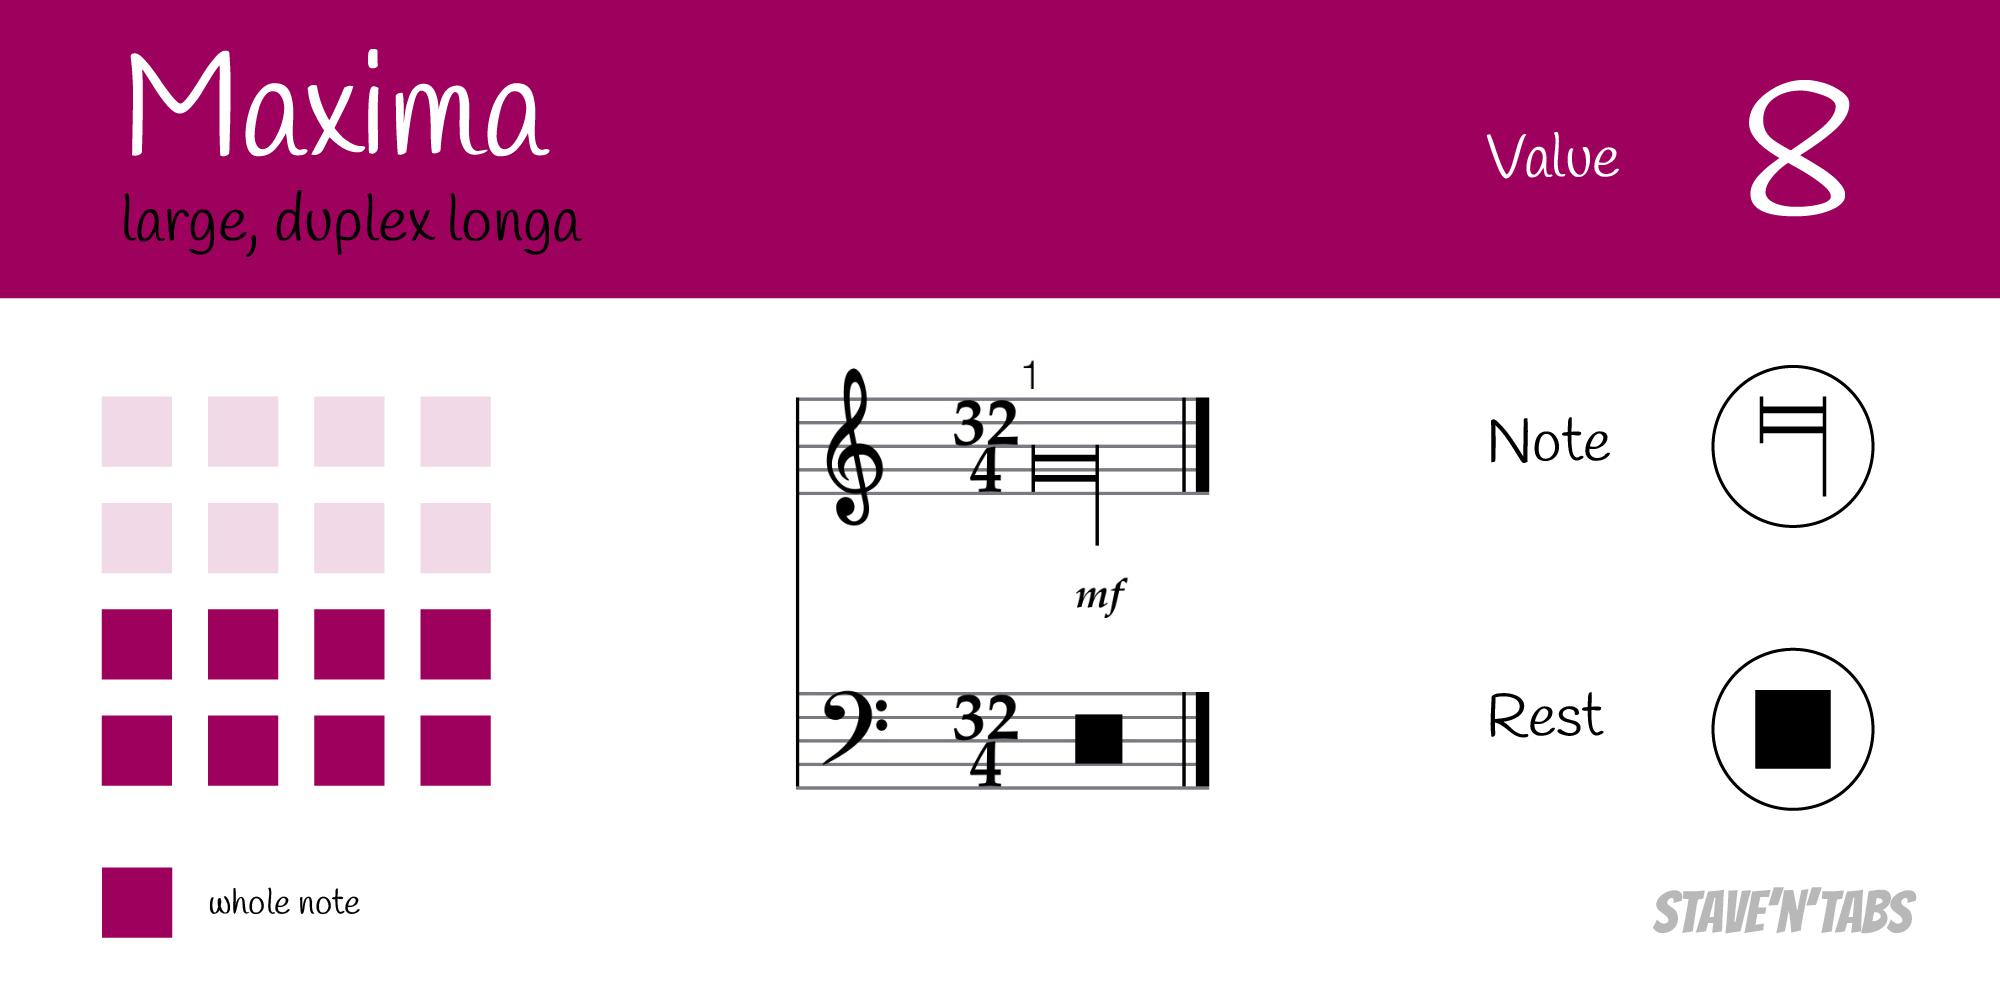 Maxima - Octuple whole note (8)